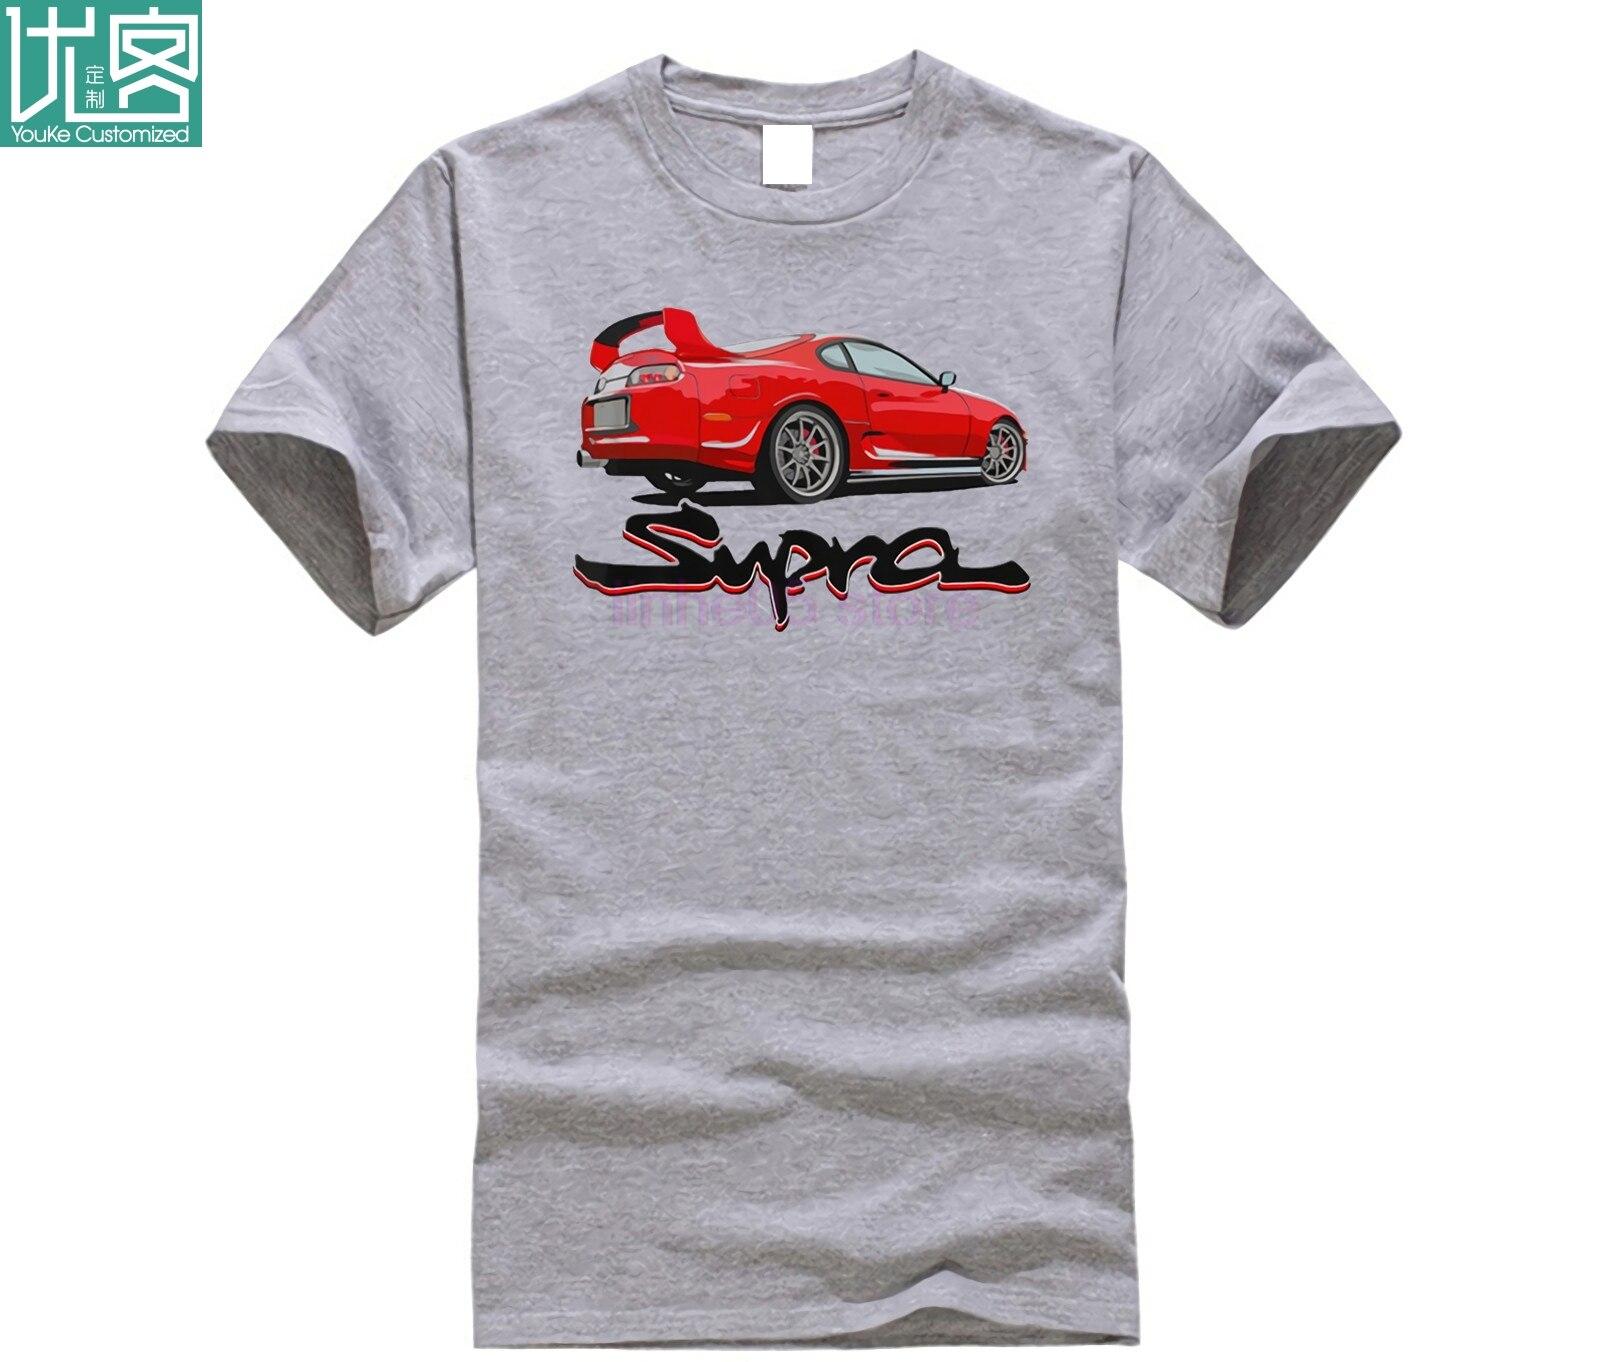 2JZ GTE A80 1993 Jdm Drifting divertido verano 2019 Cool camiseta Fans del coche japonés MK4 MKIV camisetas hombres y mujeres Phiking